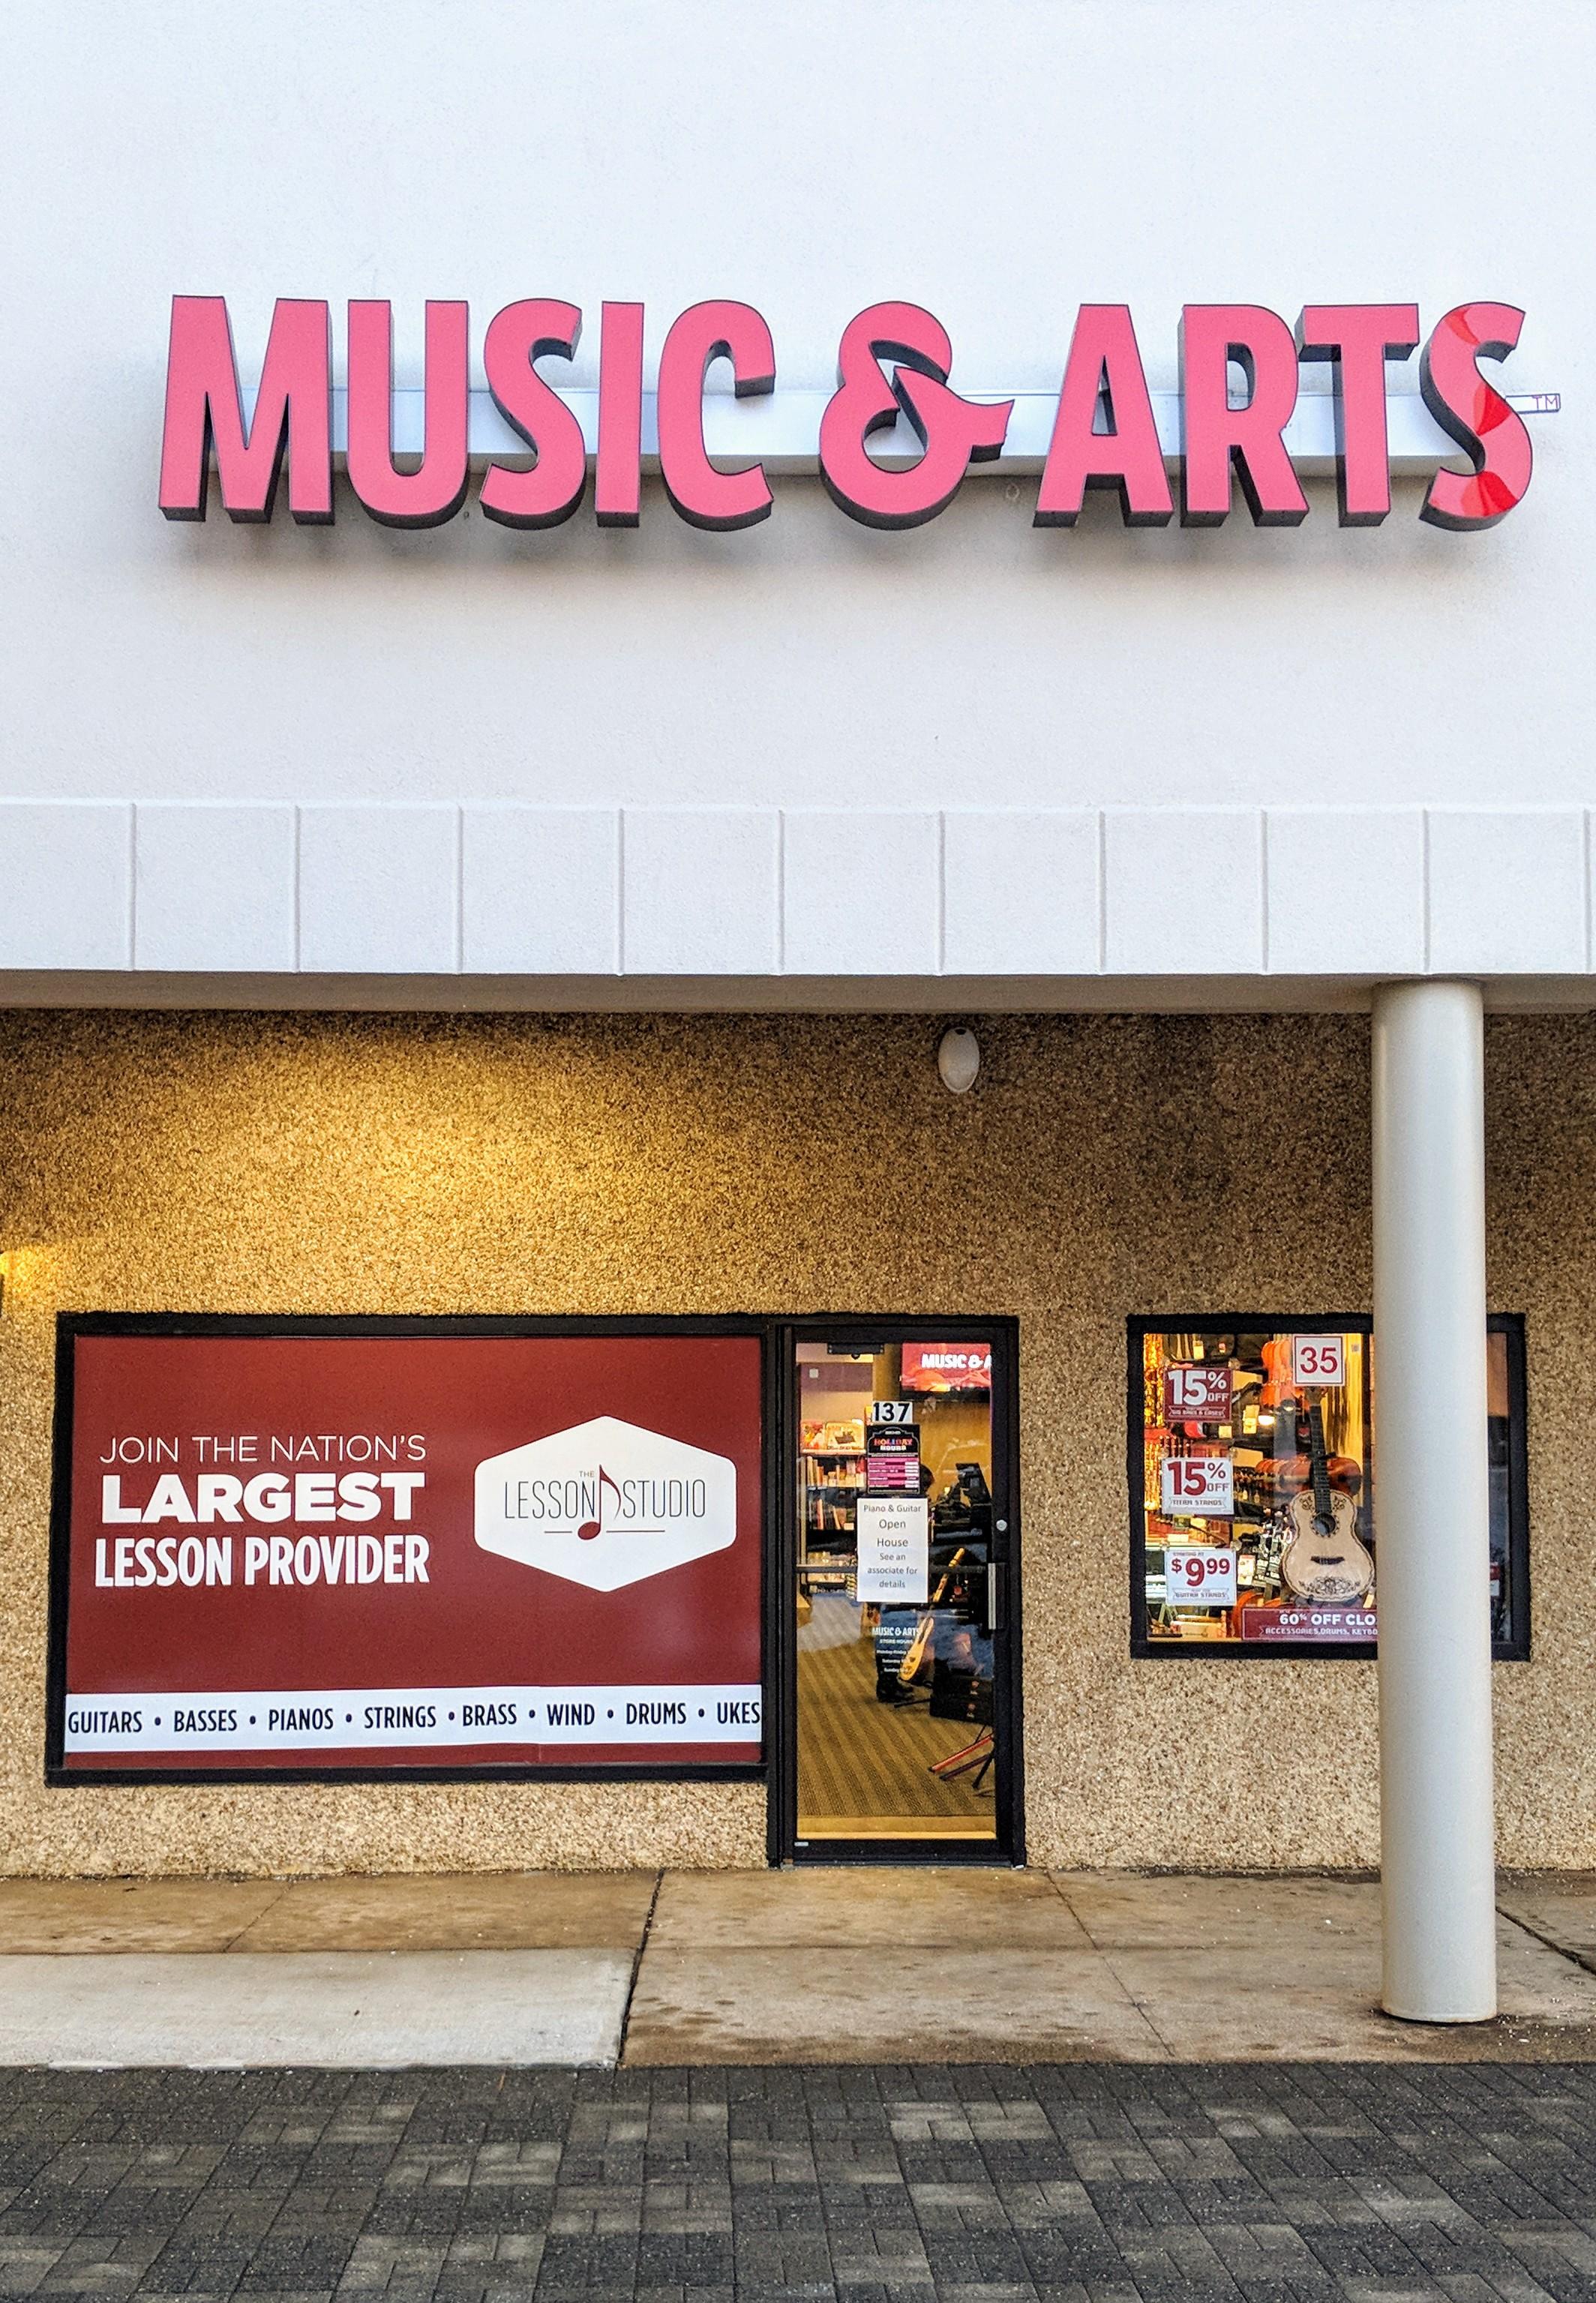 Music & Arts image 0